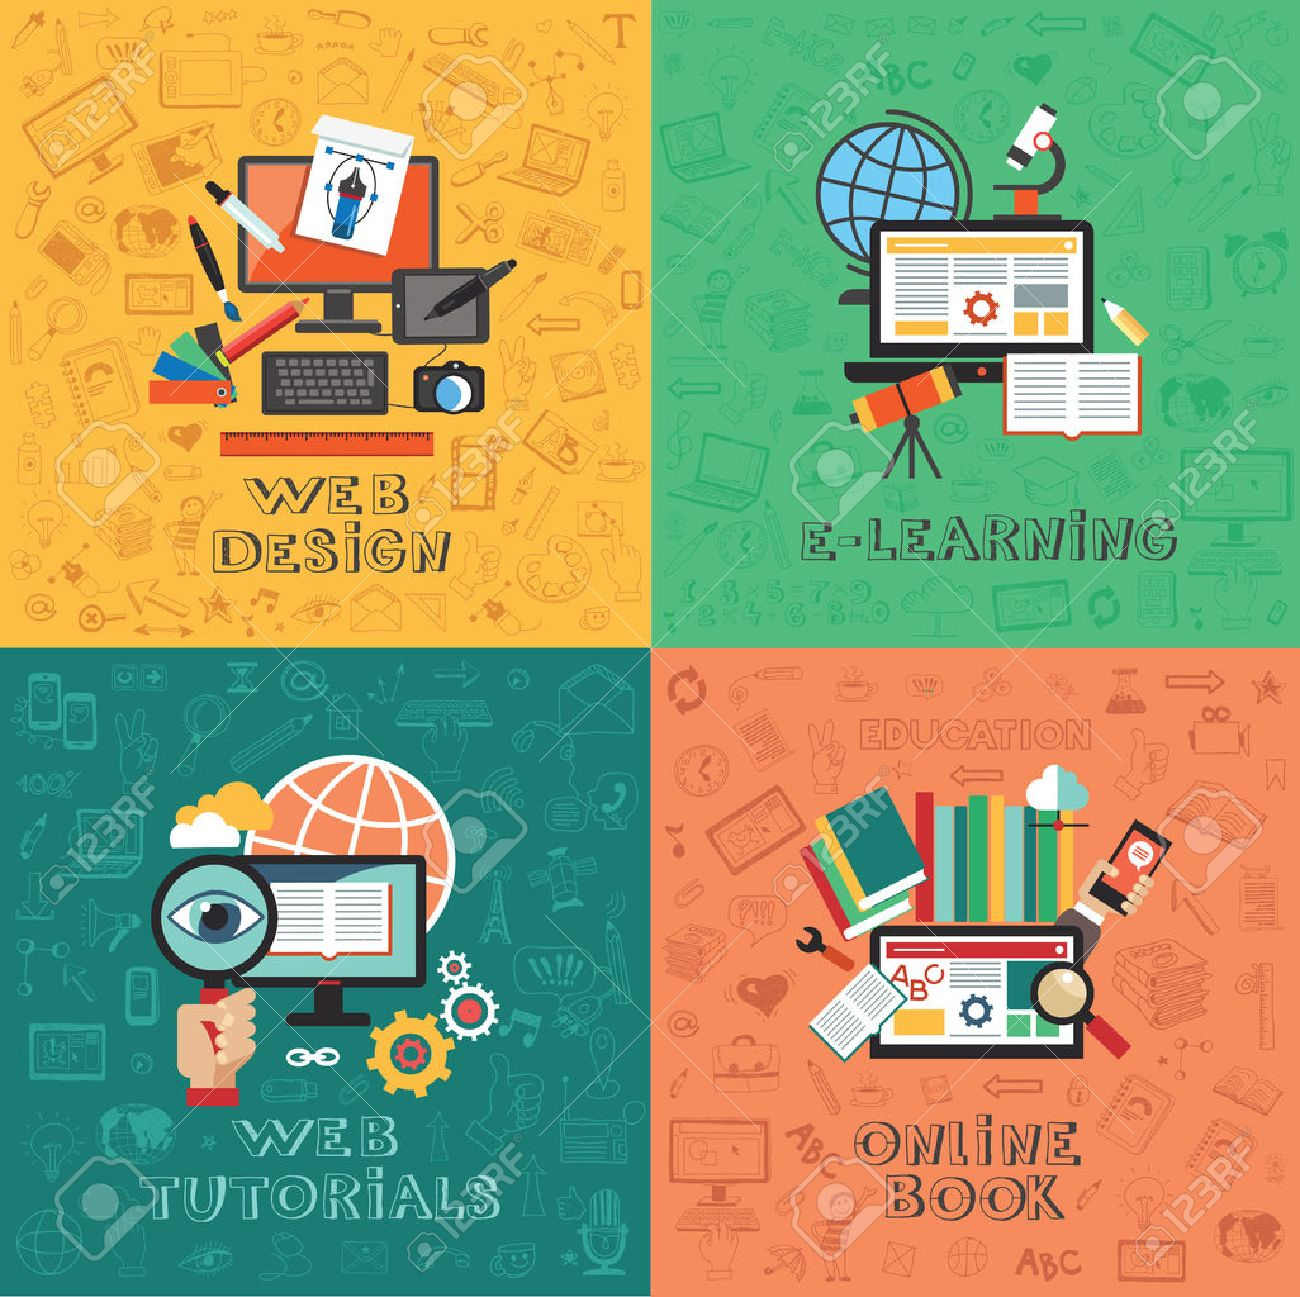 Wohnung Vektor-Konzept Bildung Infografiken. Web-Design. E-Learning. Web-Tutorials. Online buchen. Standard-Bild - 46725613